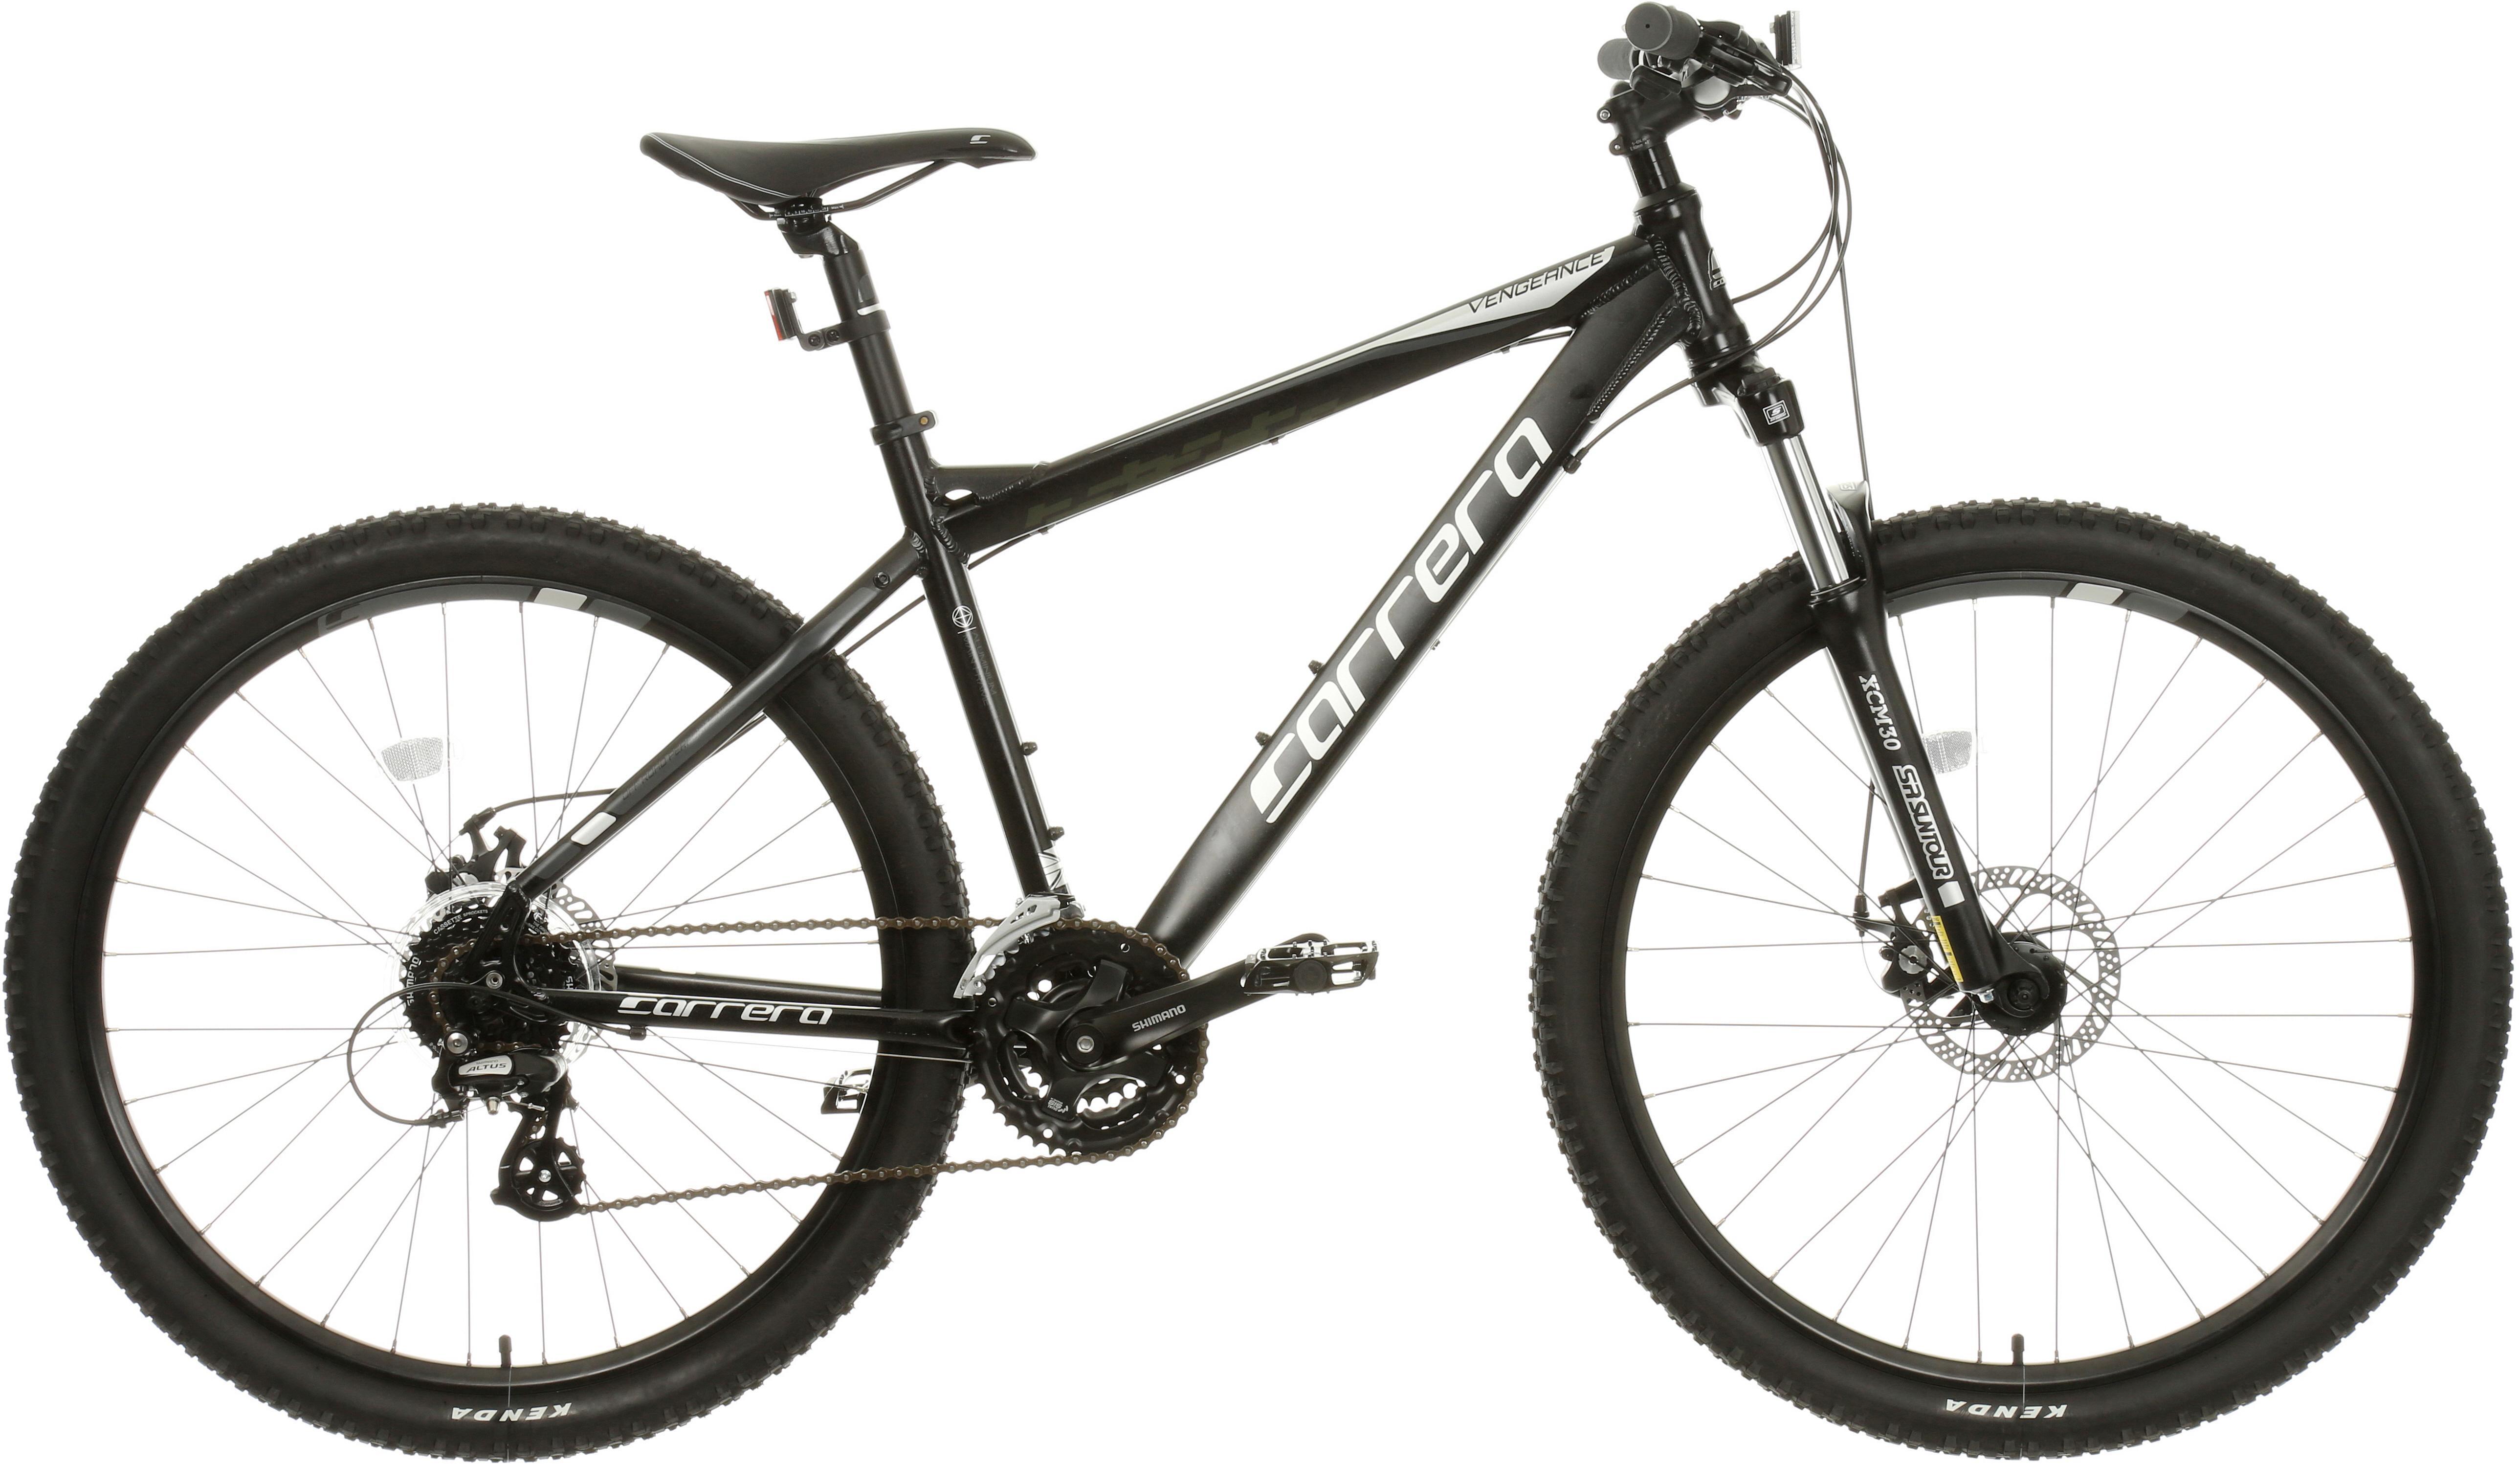 Carrera Vengeance Mens Mountain Bike - Black, M